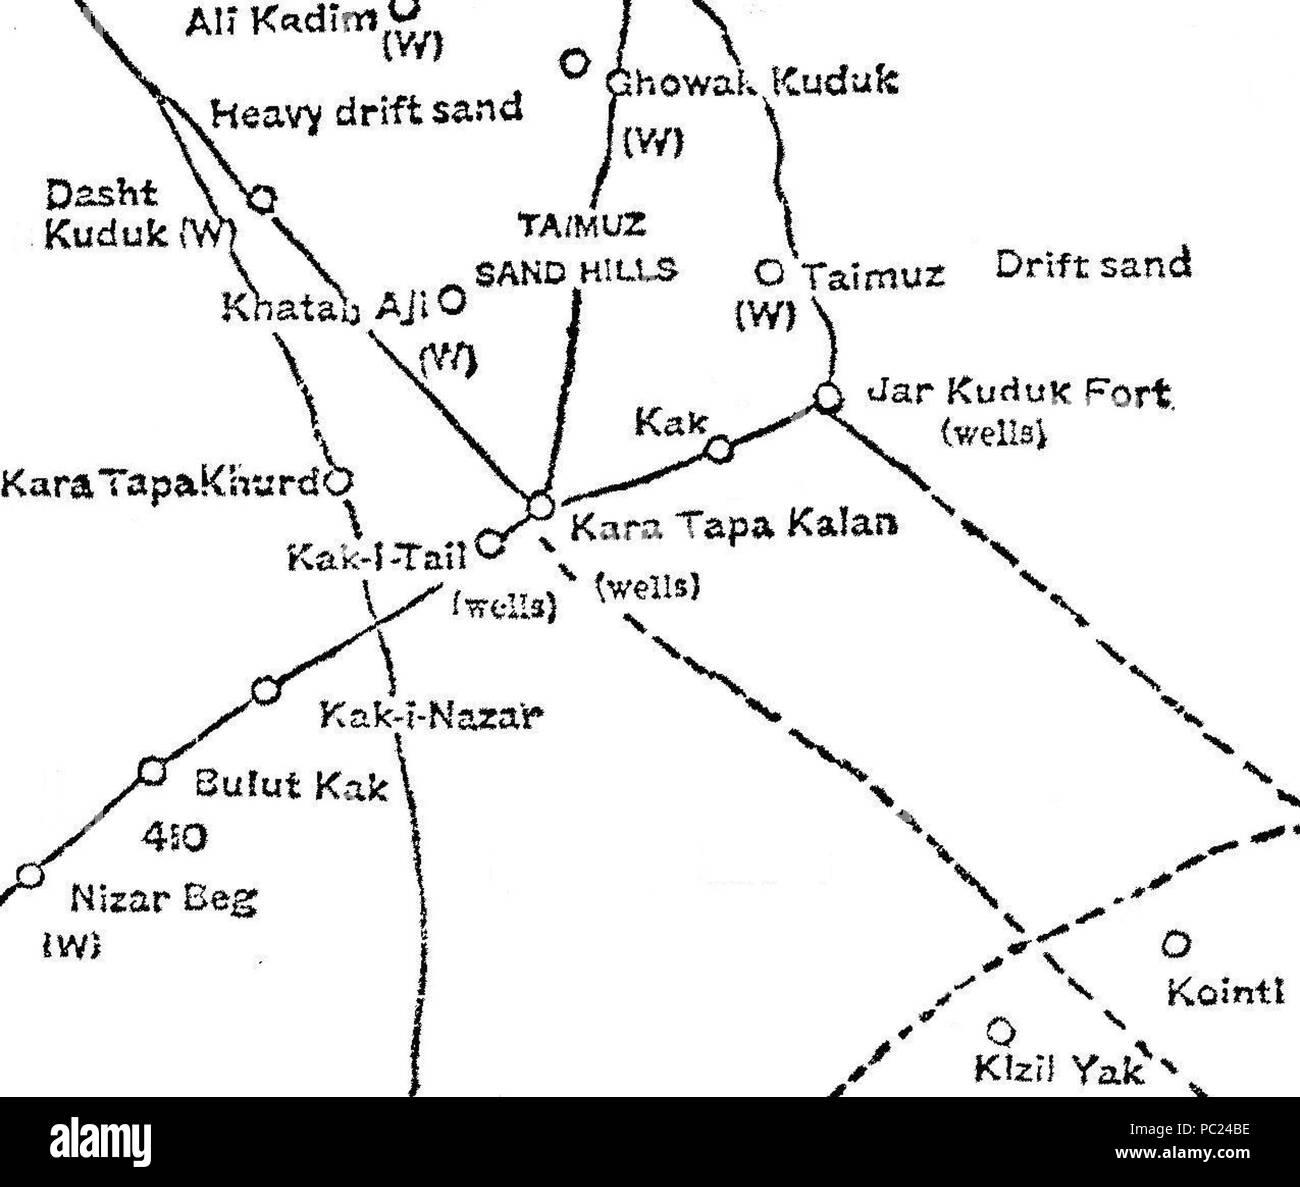 394 Map-Kara - Tapa-Kalen - Wissenschaft-1886 Stockfoto, Bild ...